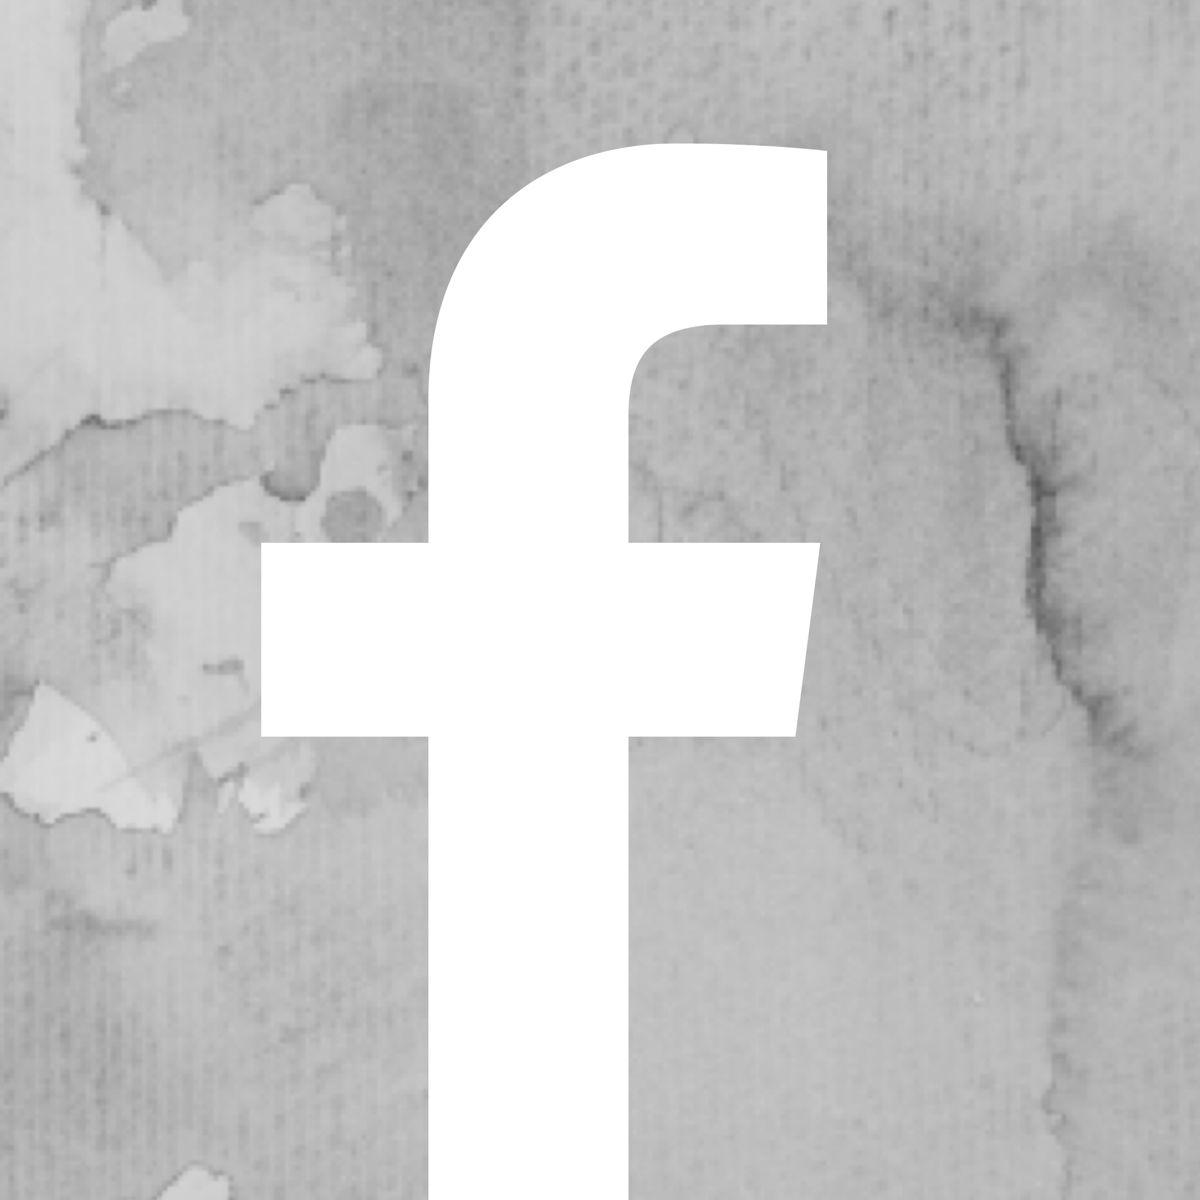 Grey Marble Facebook Pink Wallpaper Iphone Iphone Wallpaper Black Wallpapers Tumblr